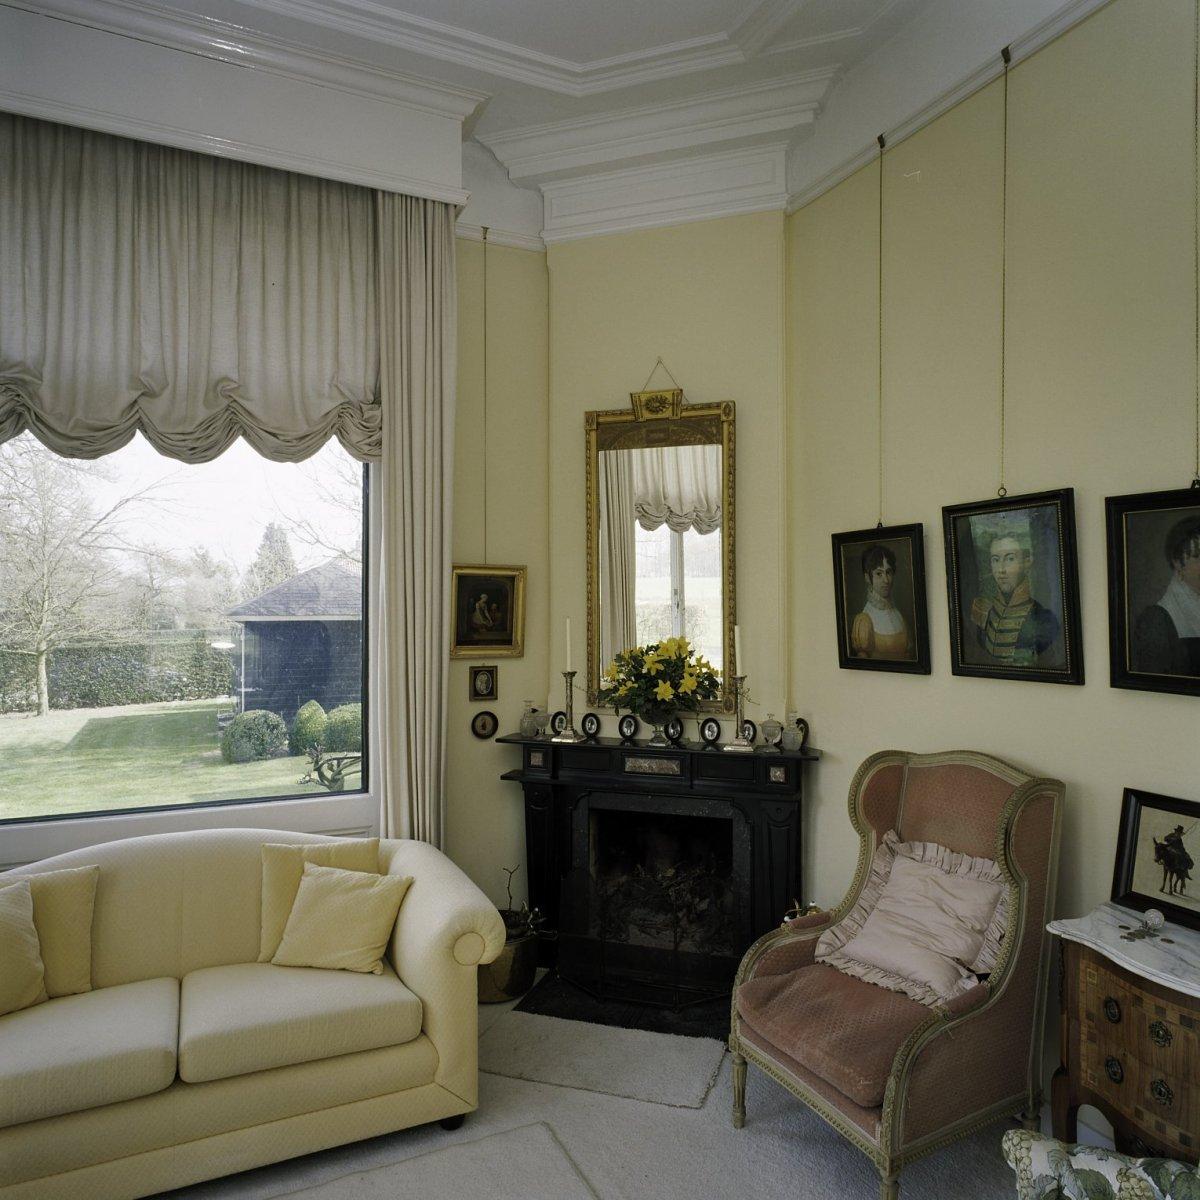 File:Interieur, woonkamer met schoorsteenmantel - Borculo - 20386650 ...